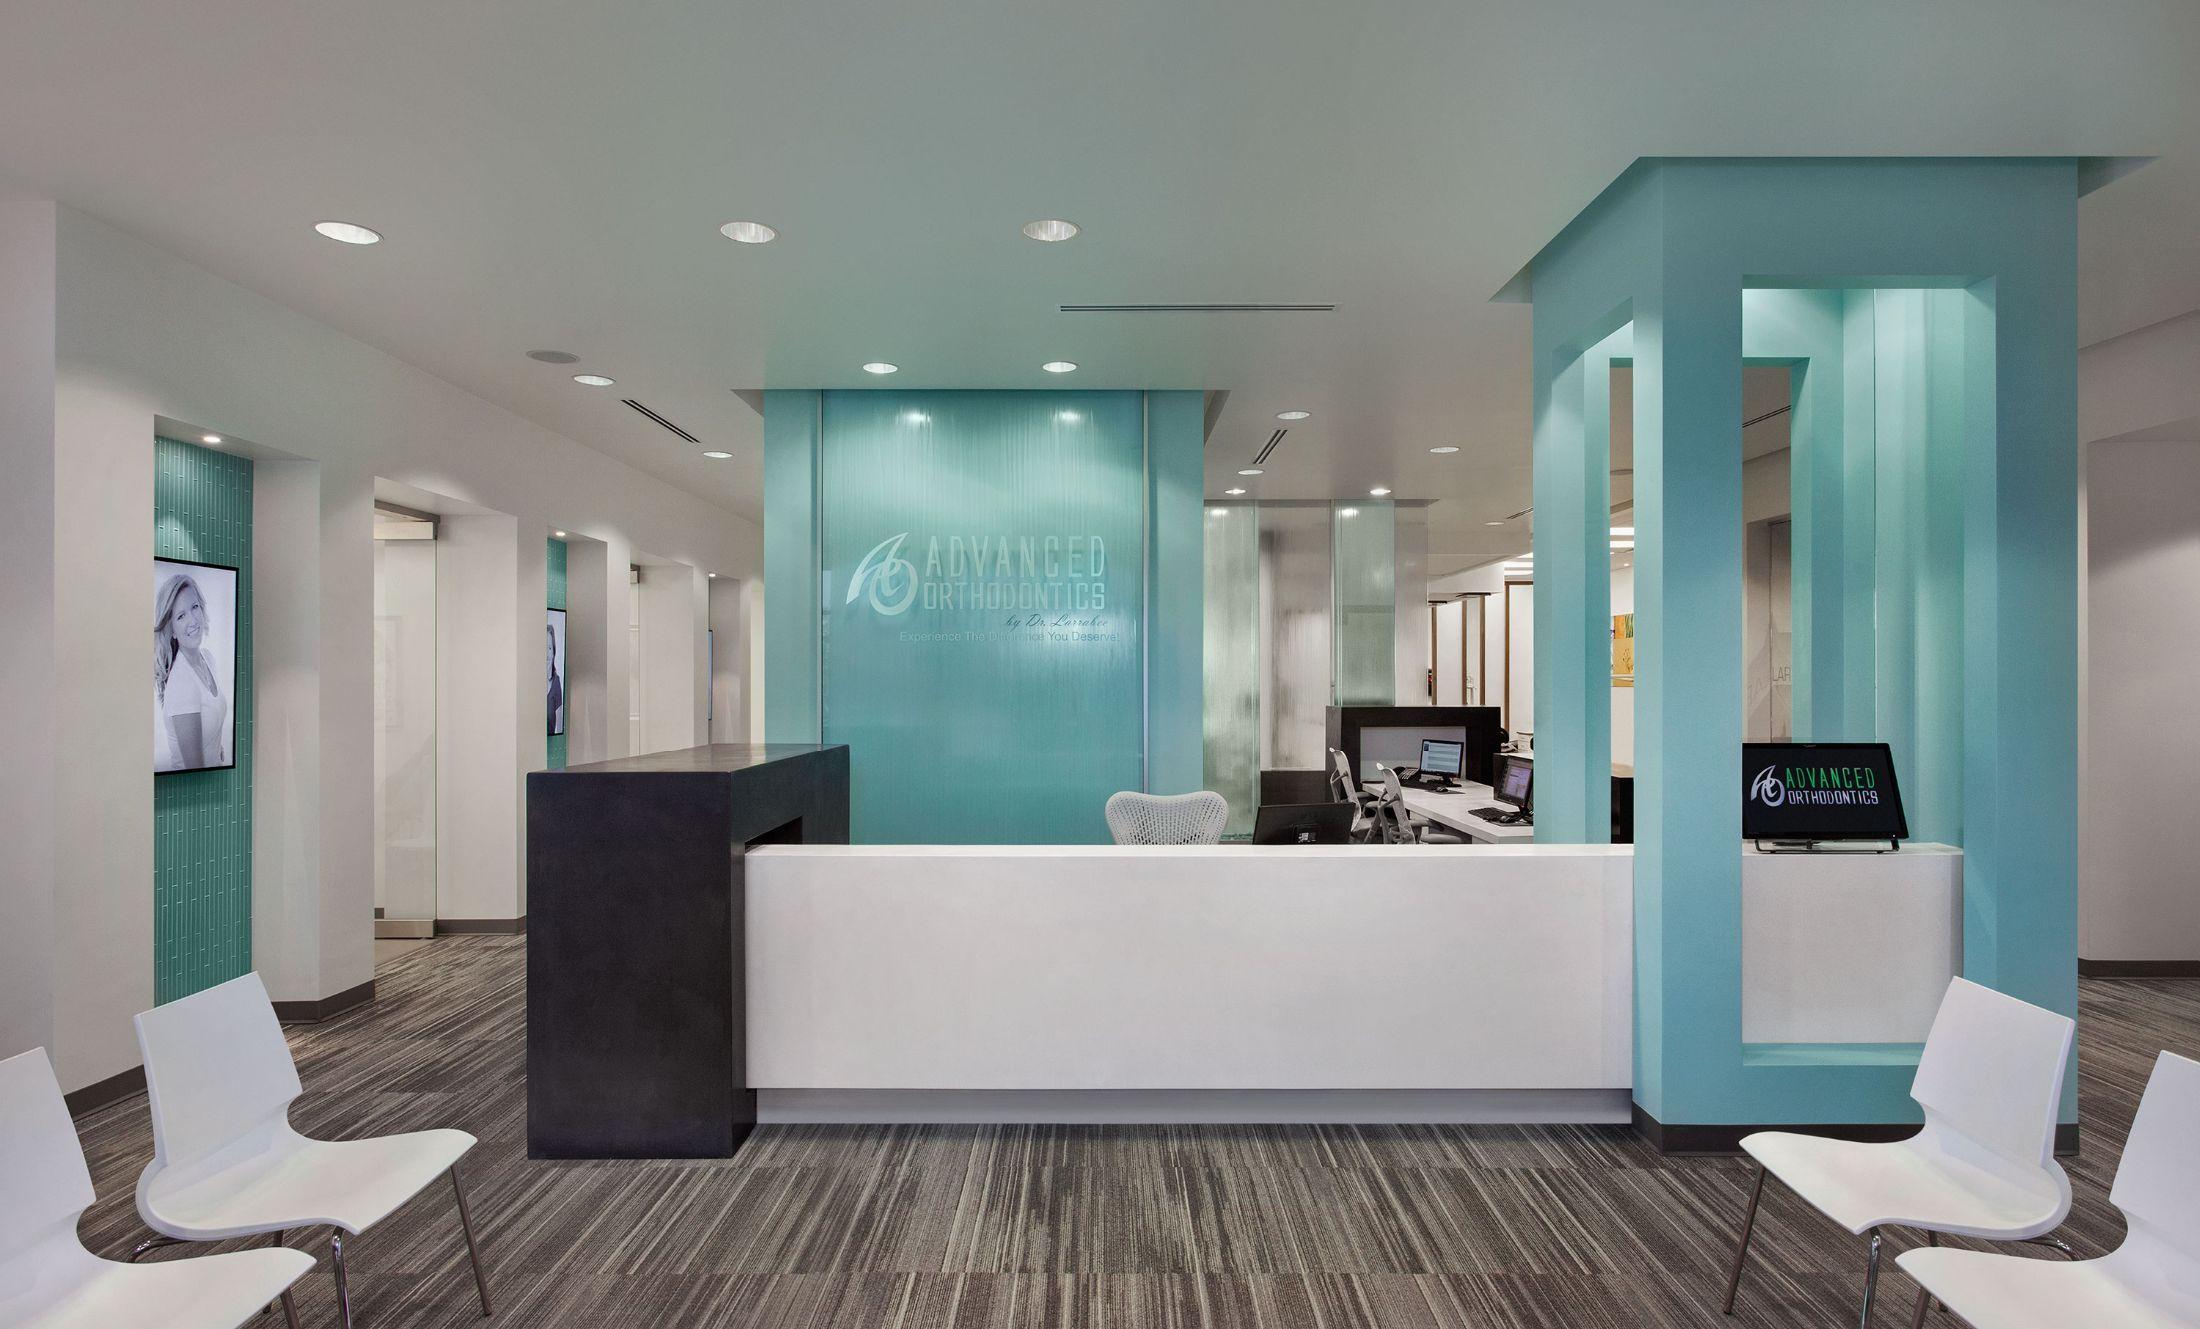 Advanced Orthodontics - JoeArchitect Orthodontic Office Design ...